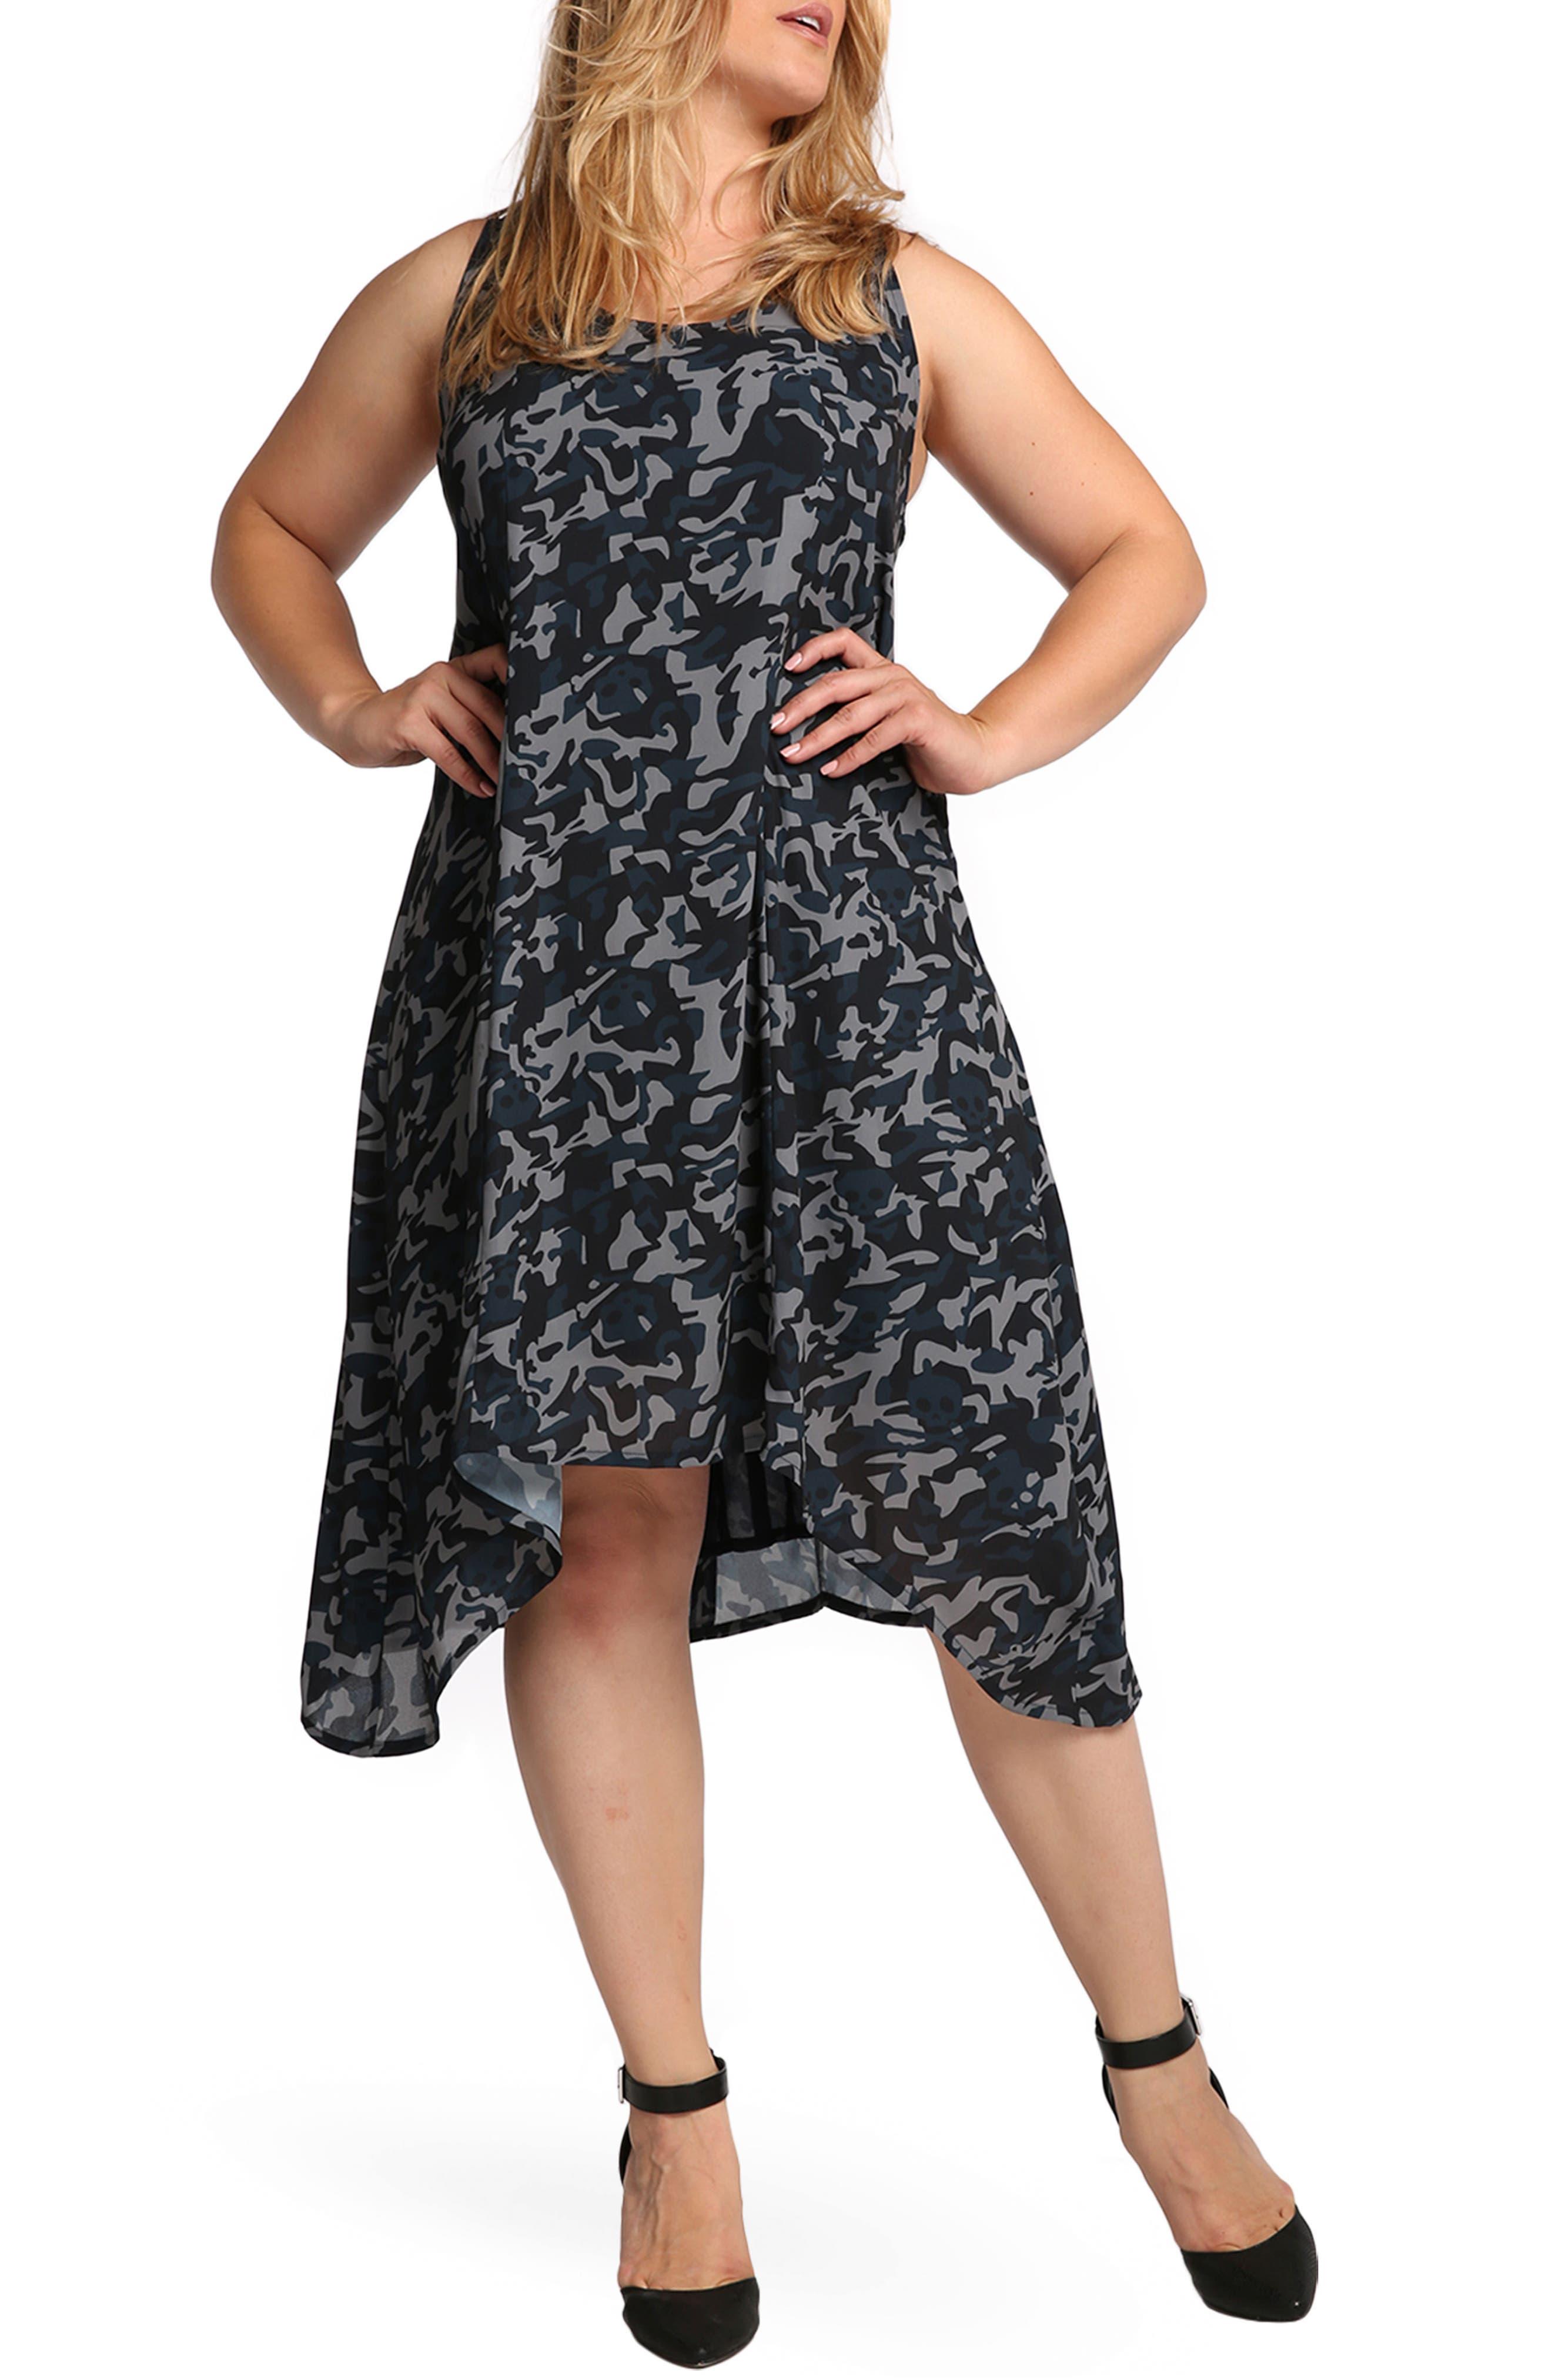 Main Image - Standards & Practices Ace Camo Print Tank Dress (Plus Size)